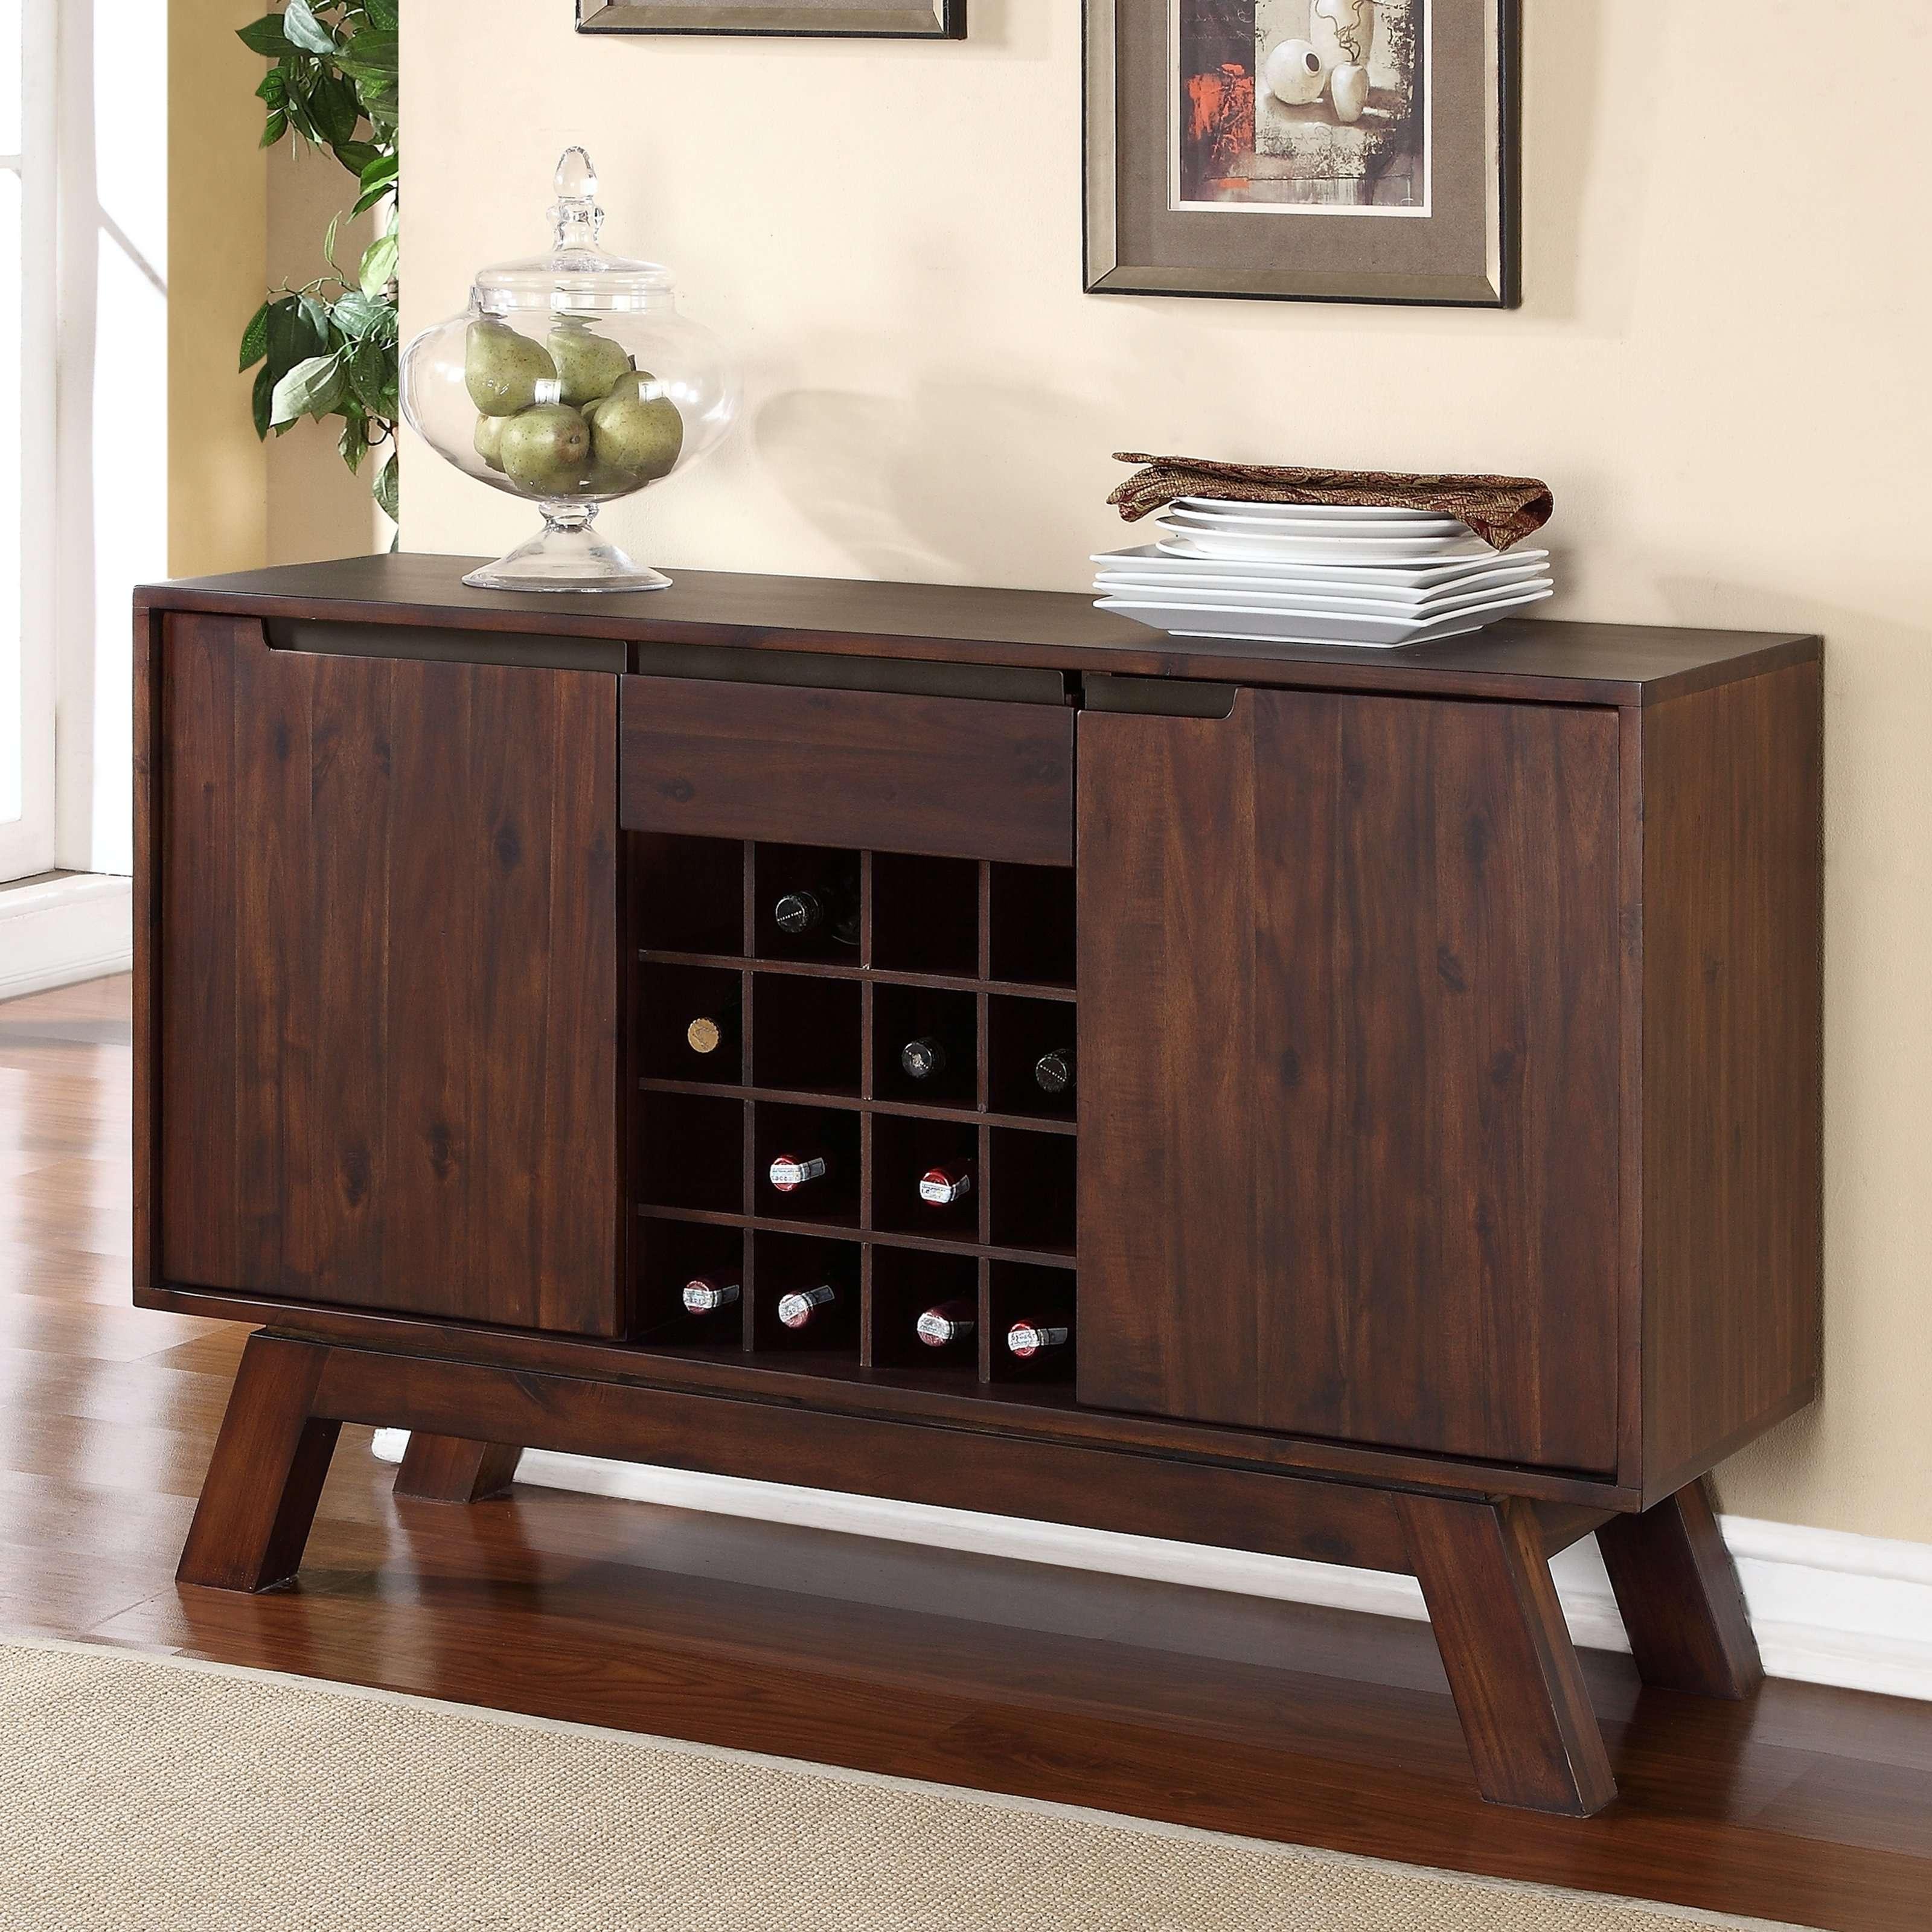 Modus Portland Solid Wood Sideboard – Medium Walnut | Hayneedle Within Solid Wood Sideboards (View 11 of 20)